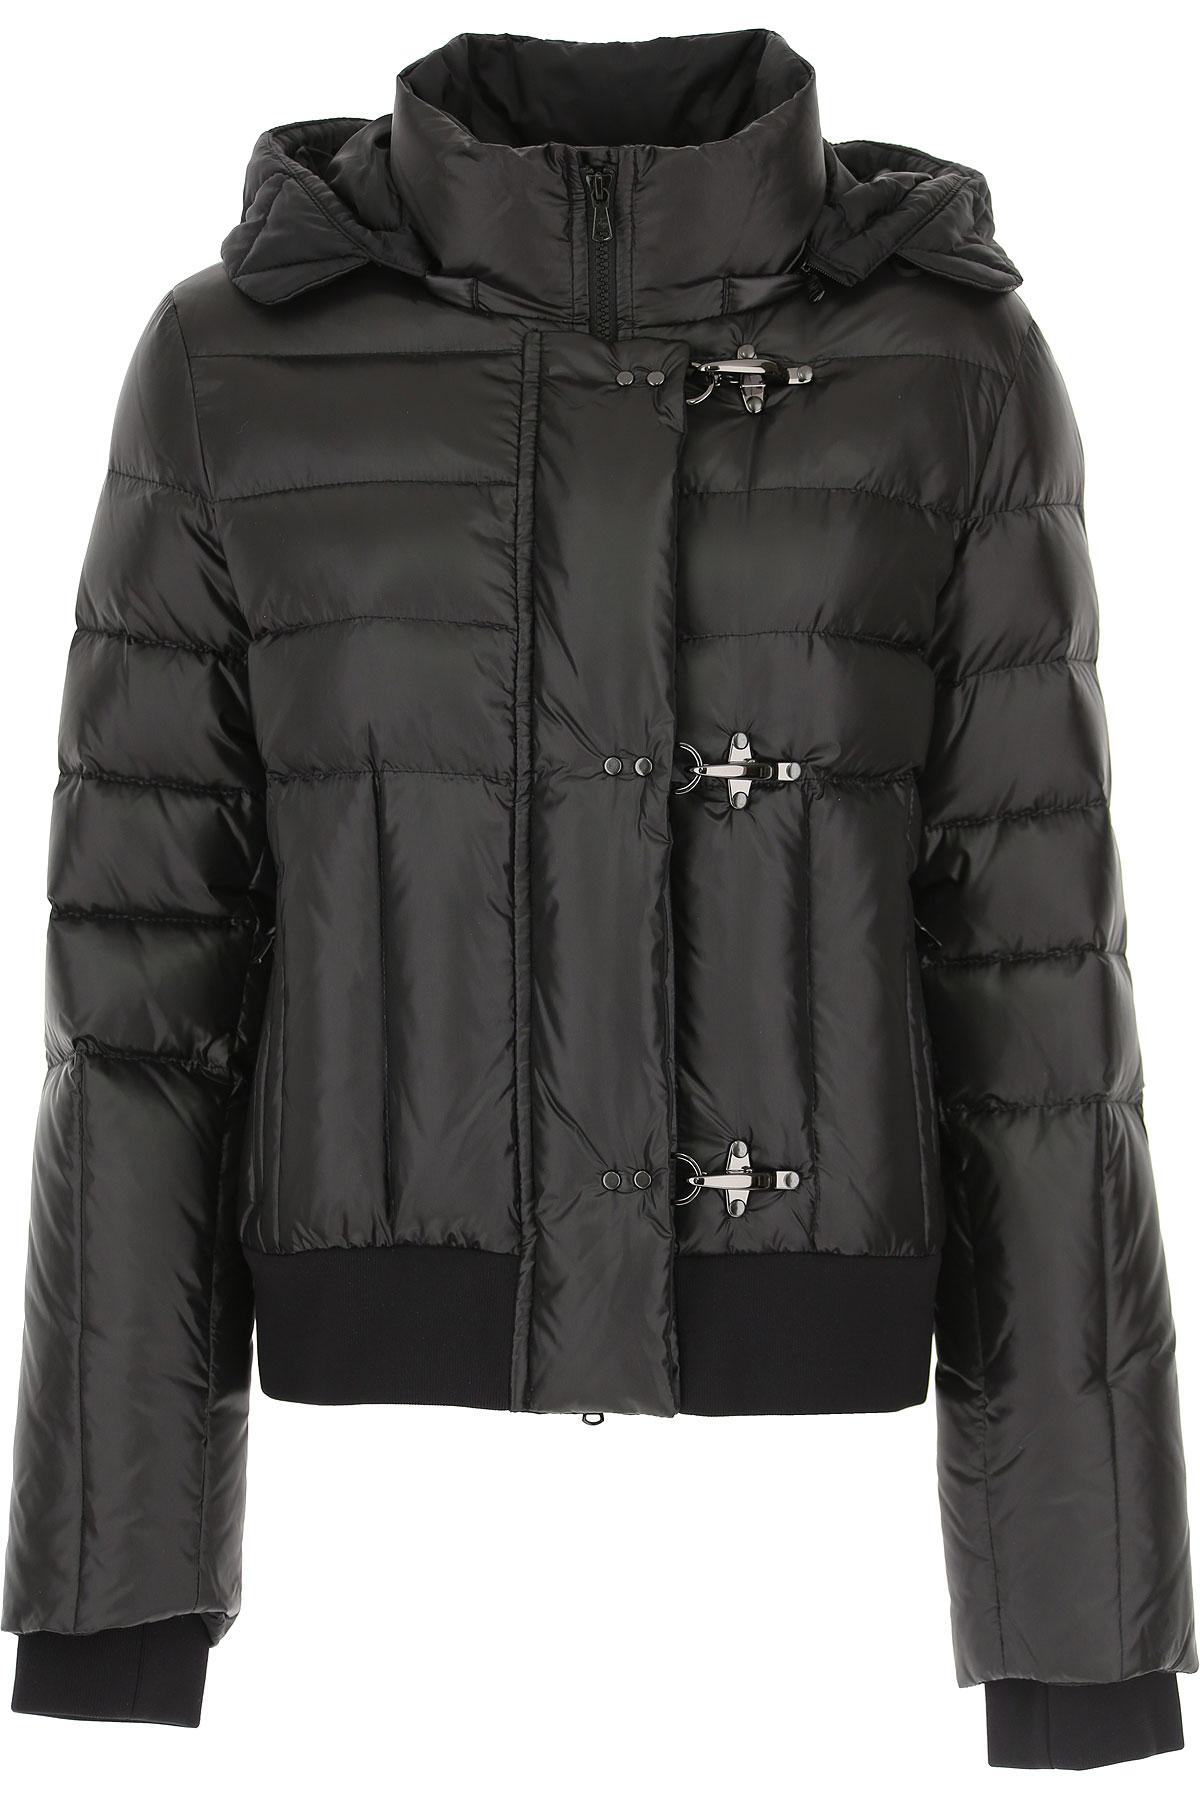 Fay Down Jacket for Women, Puffer Ski Jacket On Sale, Black, polyamide, 2019, 10 8